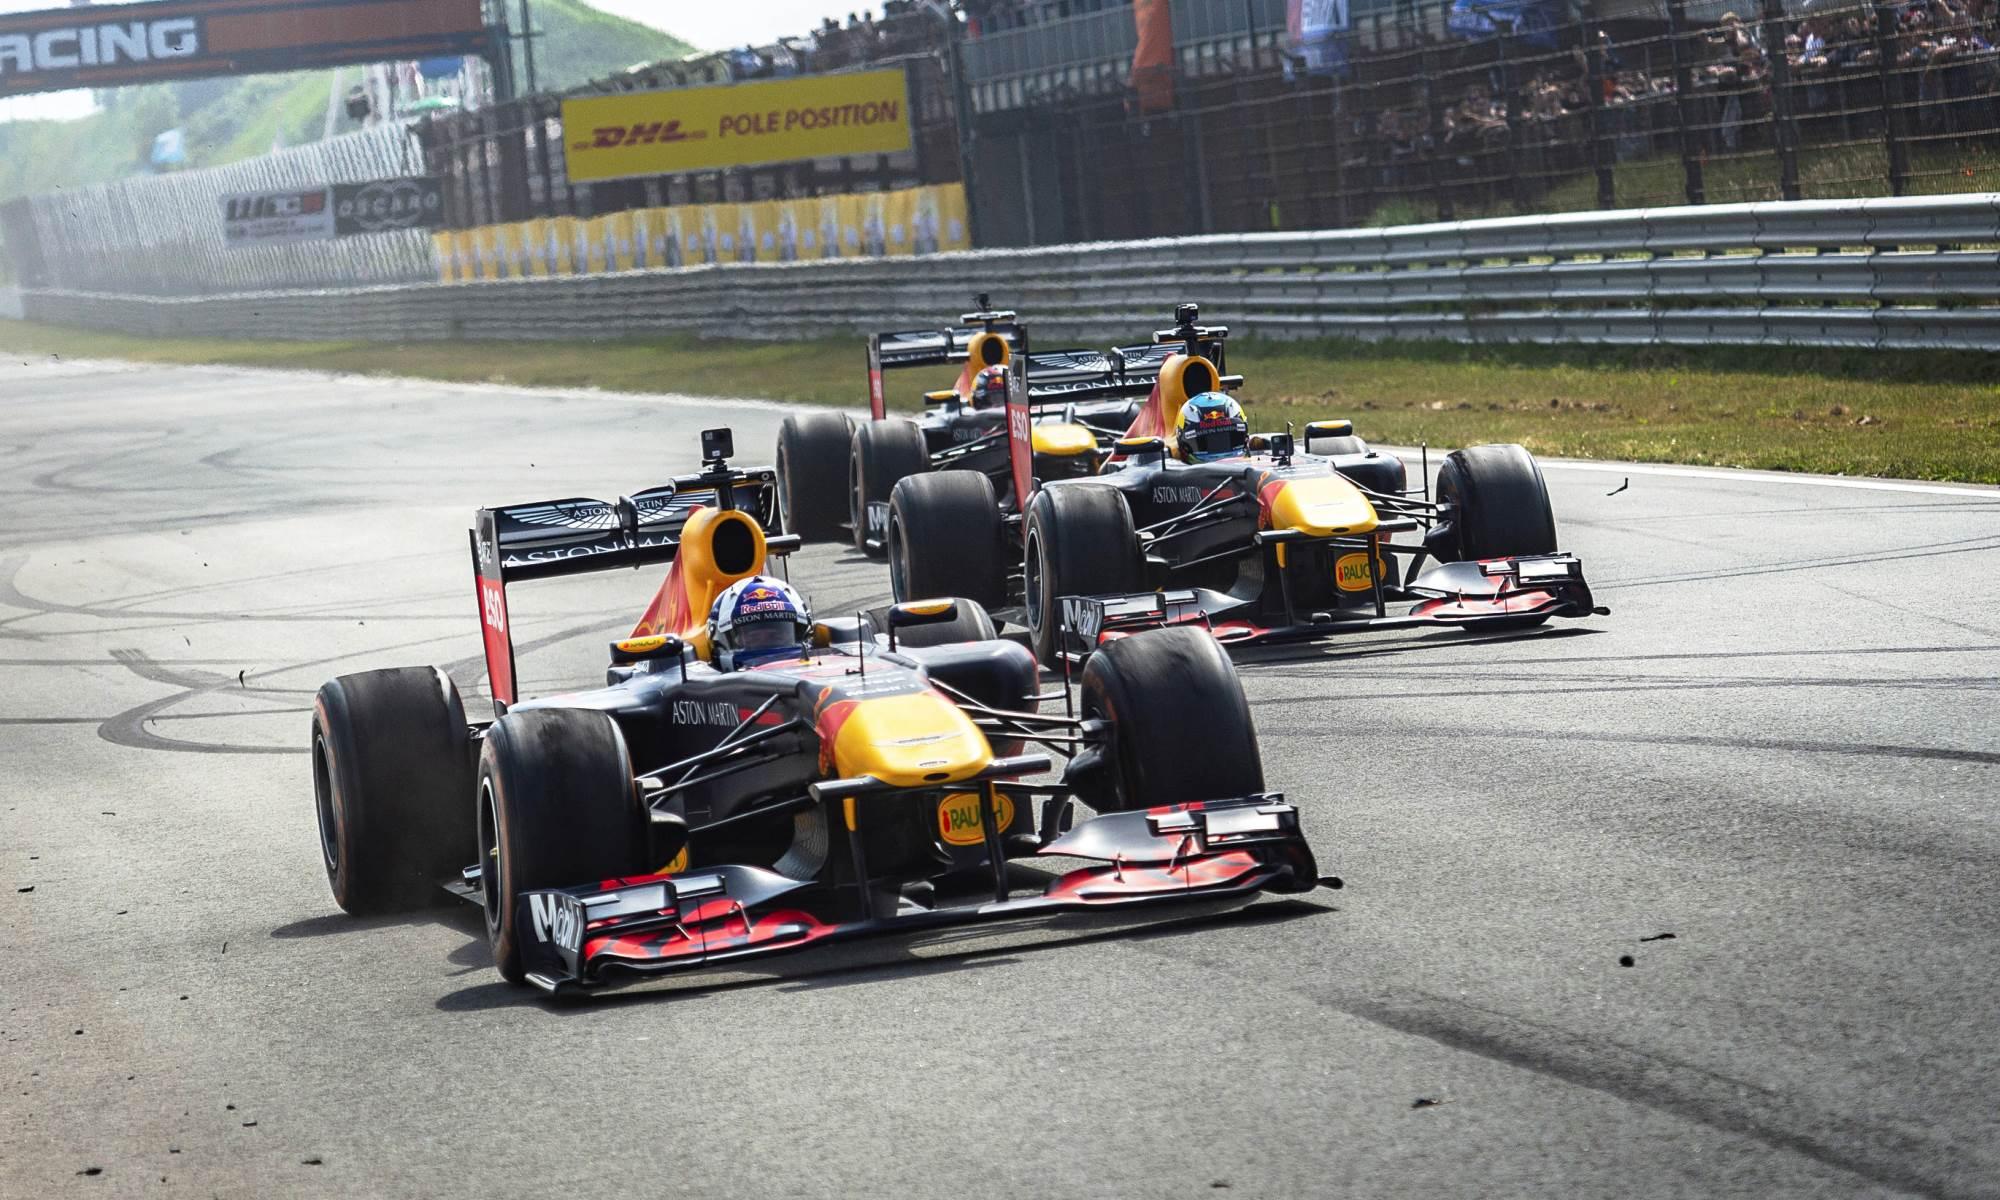 Max Verstappen, Daniel Ricciardo and David Coulthard perform at the Red Bull F1 Showrun at Zandvoort